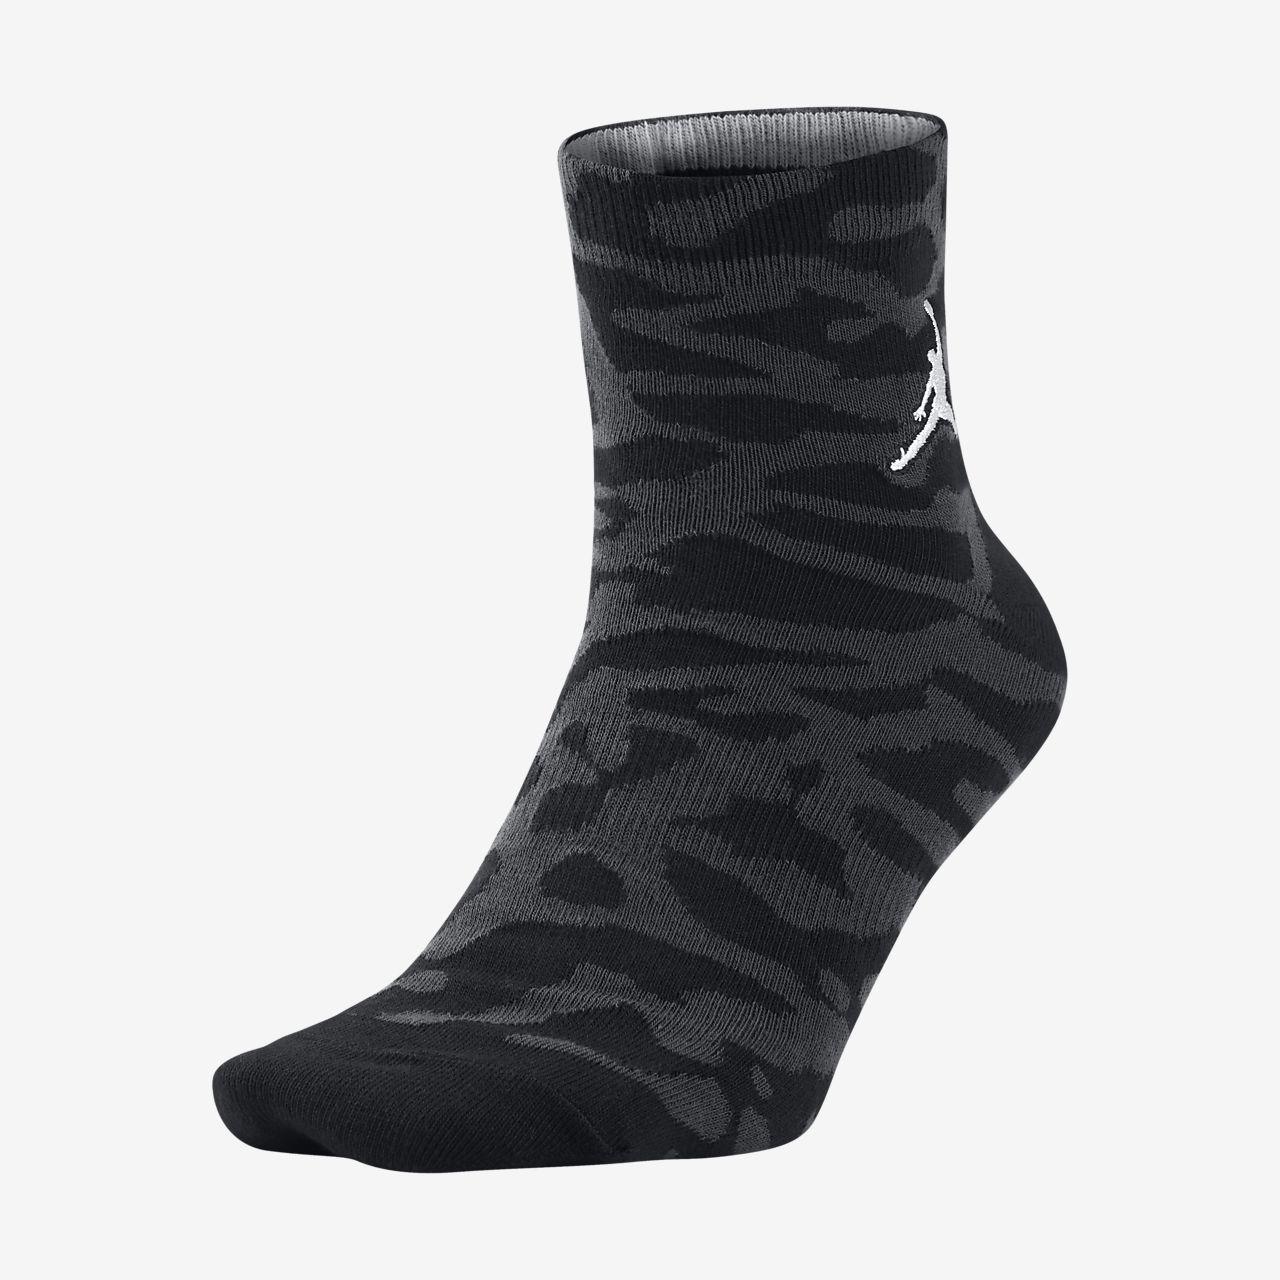 9f399358a03f Jordan Elephant Print Quarter Socks. Nike.com CH